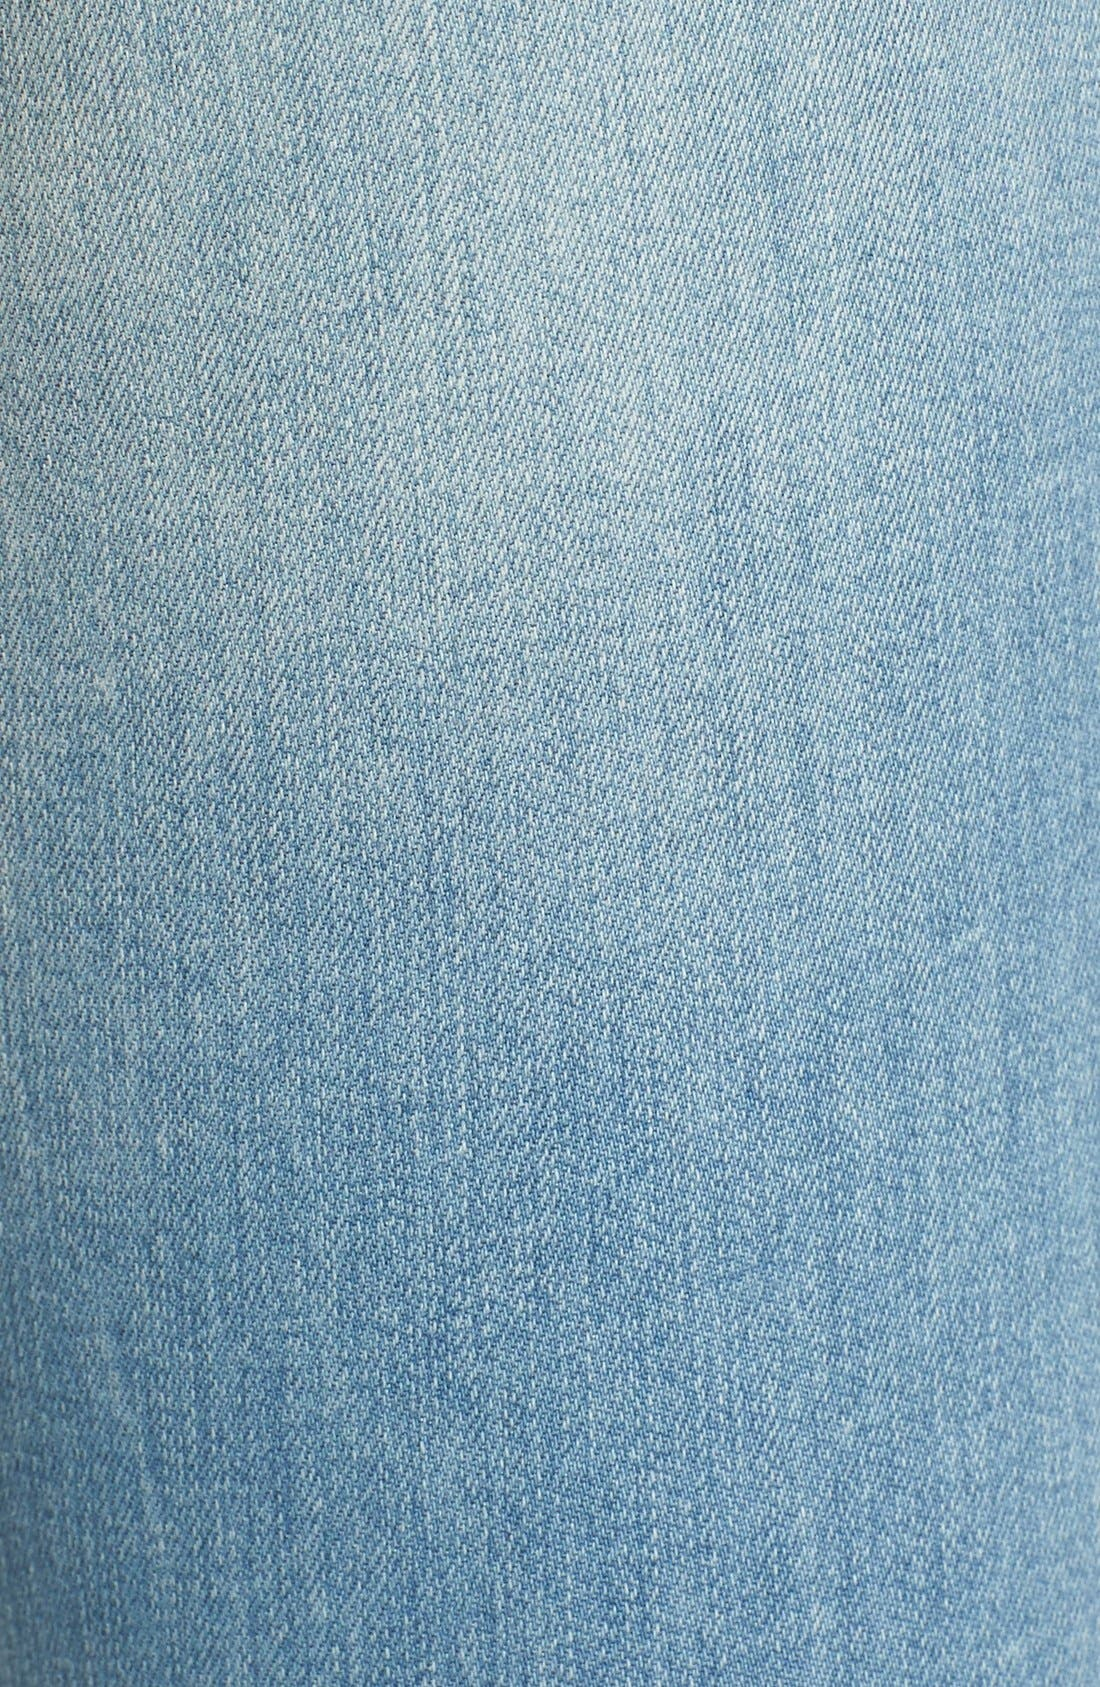 Alternate Image 5  - Articles of Society 'Mya' Skinny Jeans (Indigo Wash)